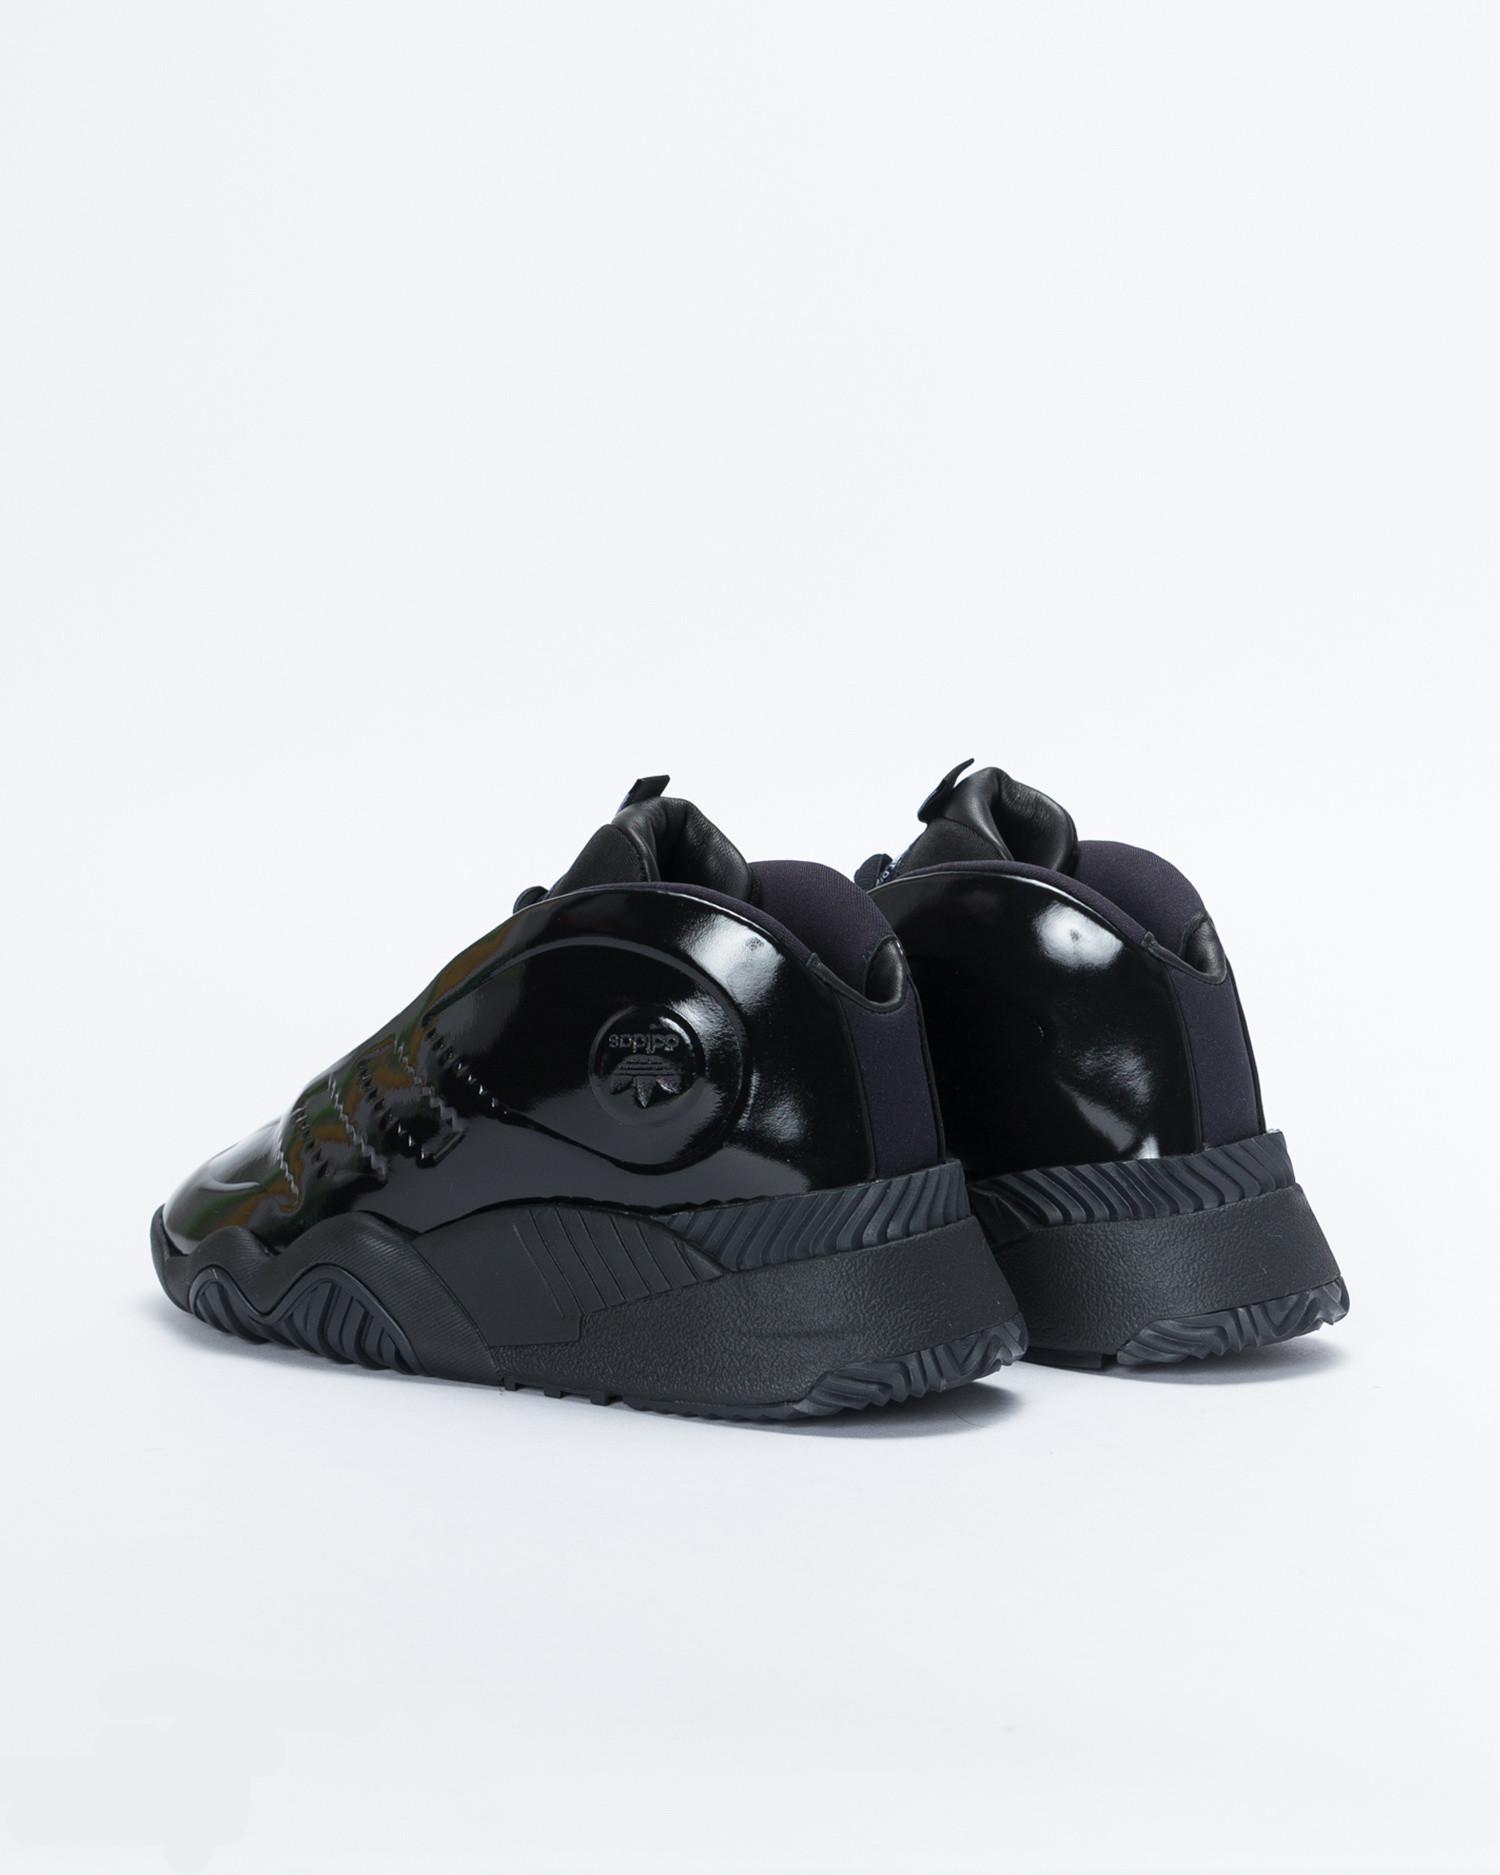 adidas x Alexander Wang Futureshell CBlack/Cblack/Cblack